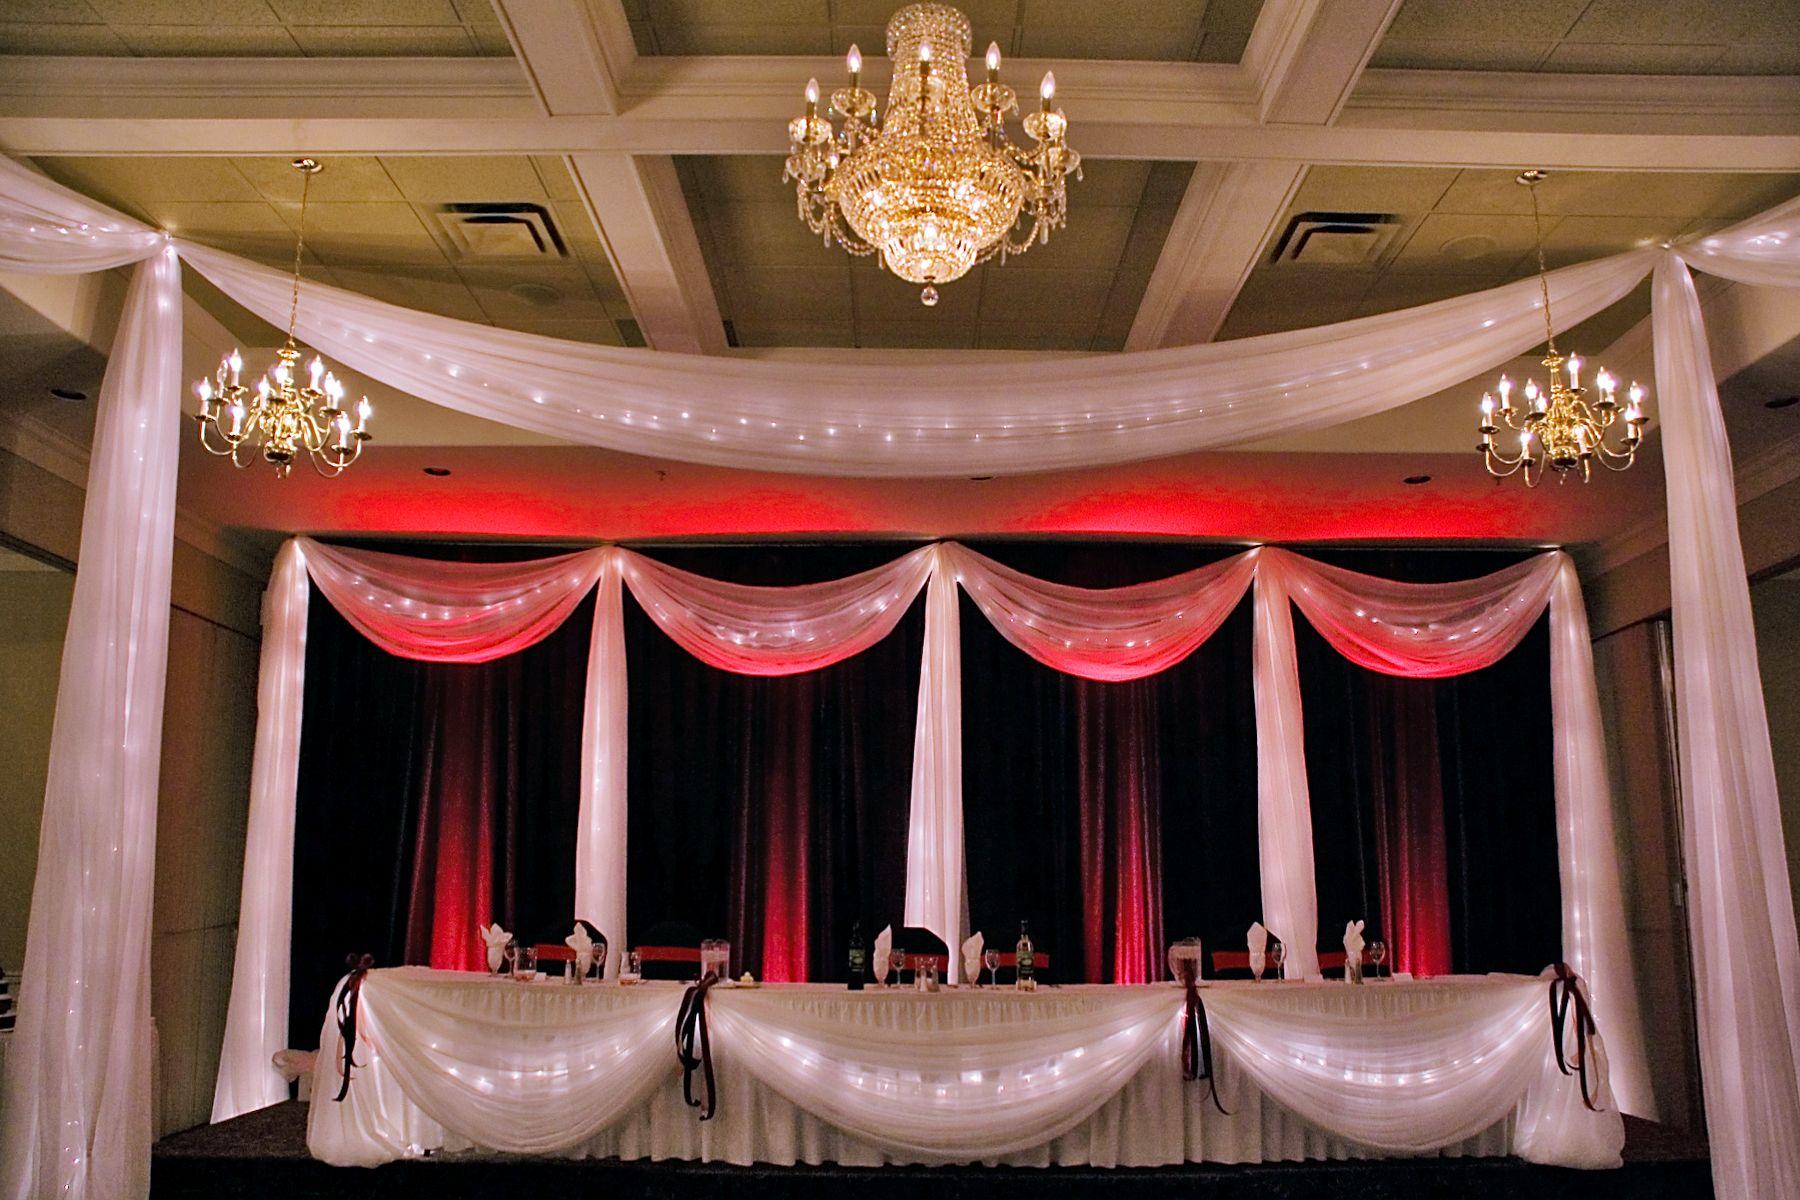 Manteo Resort Wedding Backdrop, Red And Black Backdrop, Dance Floor